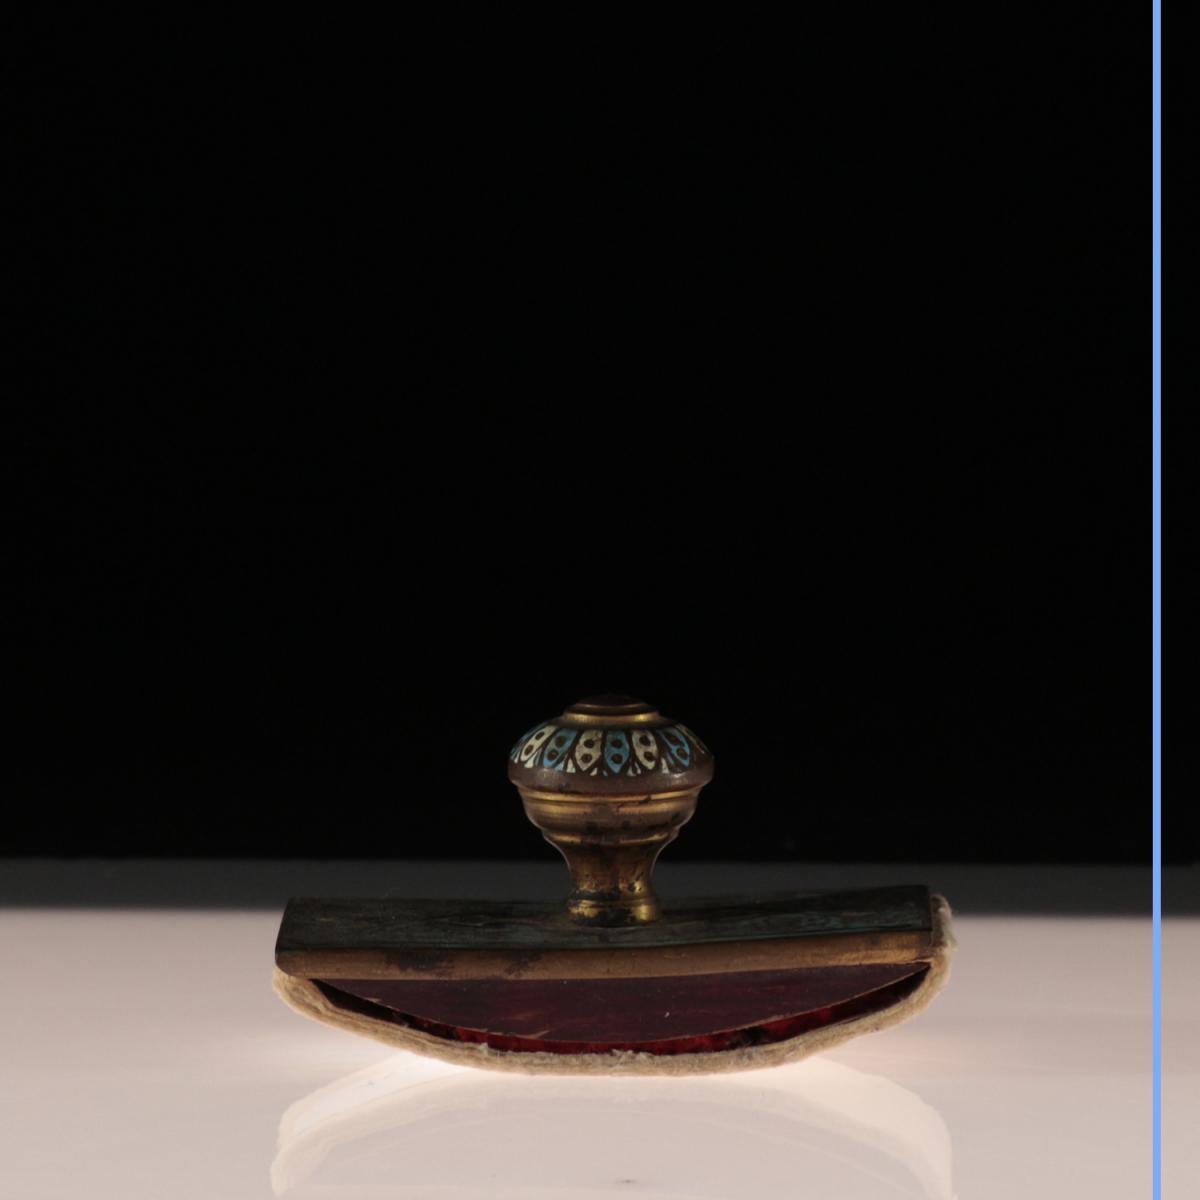 Tampon-buvardn en émaux cloisonnés, XIXe